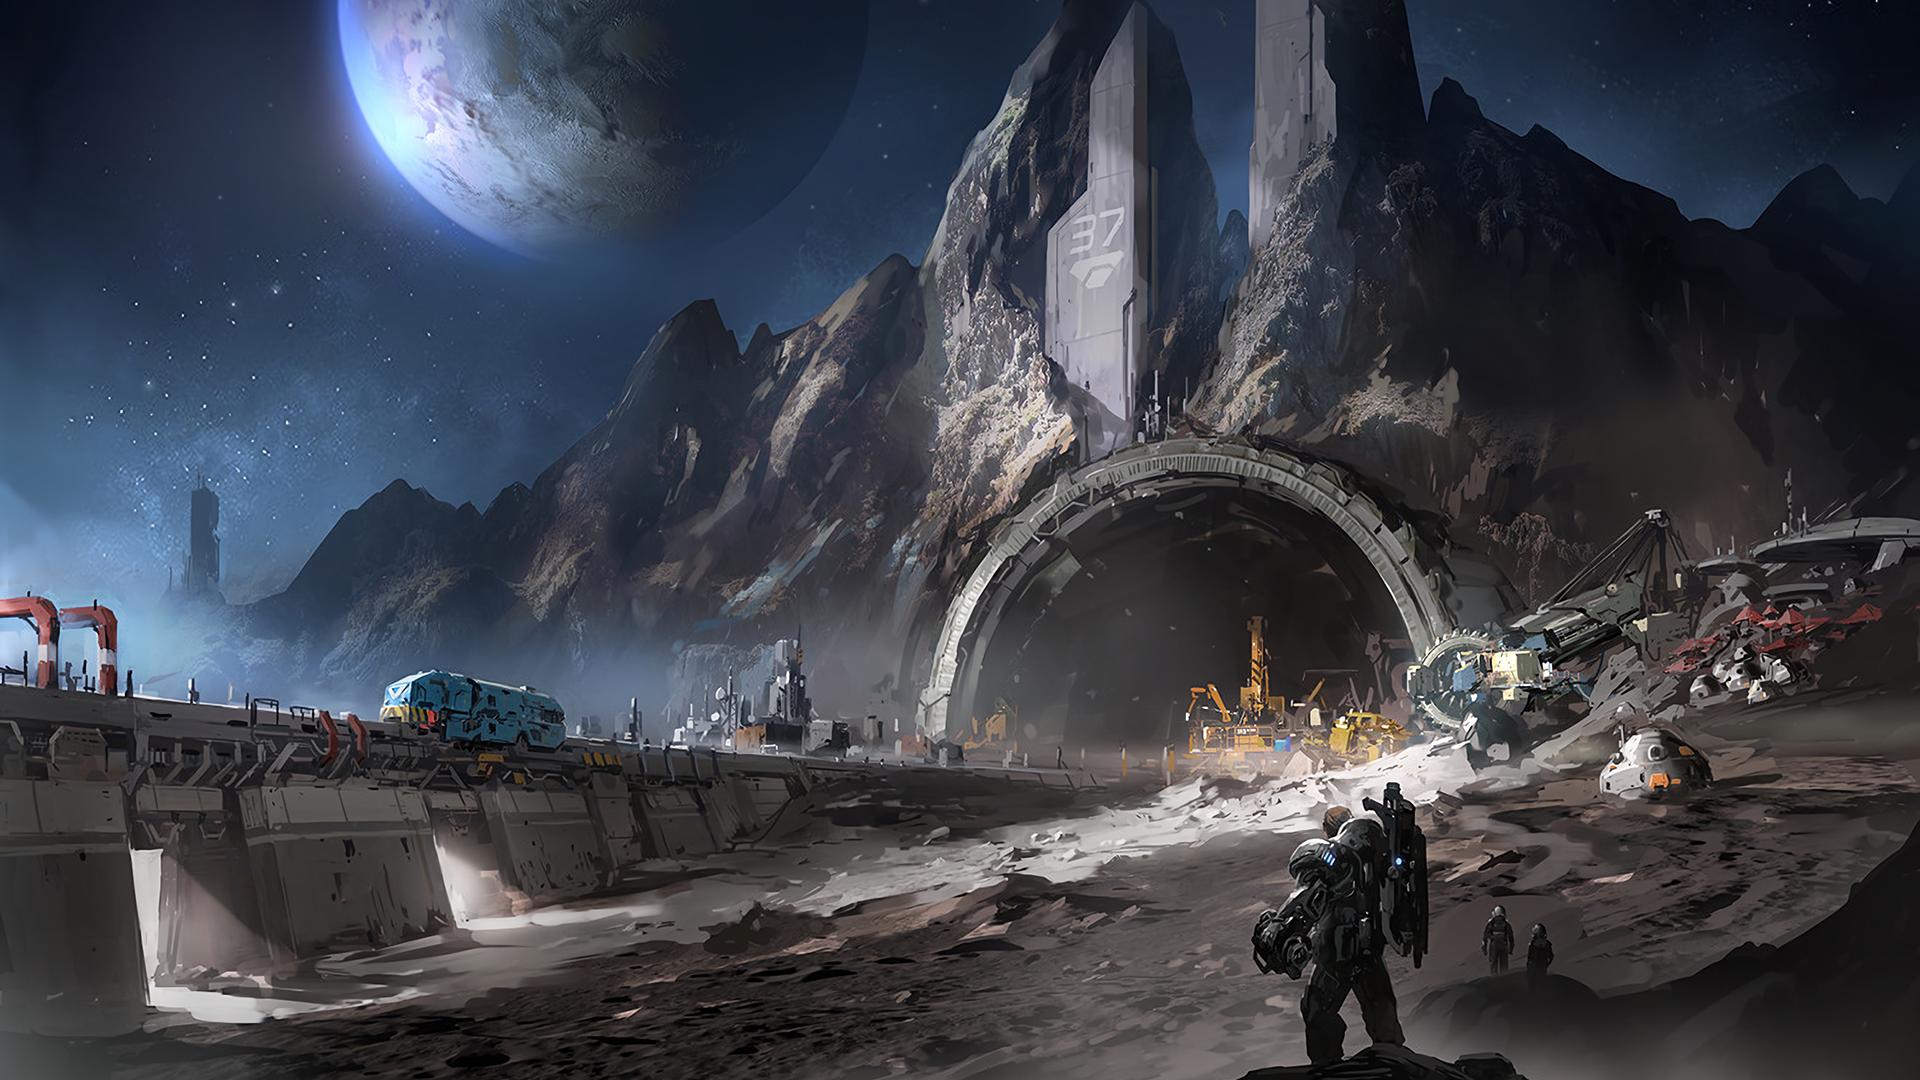 Moon mine myconfinedspace - Mining images hd ...